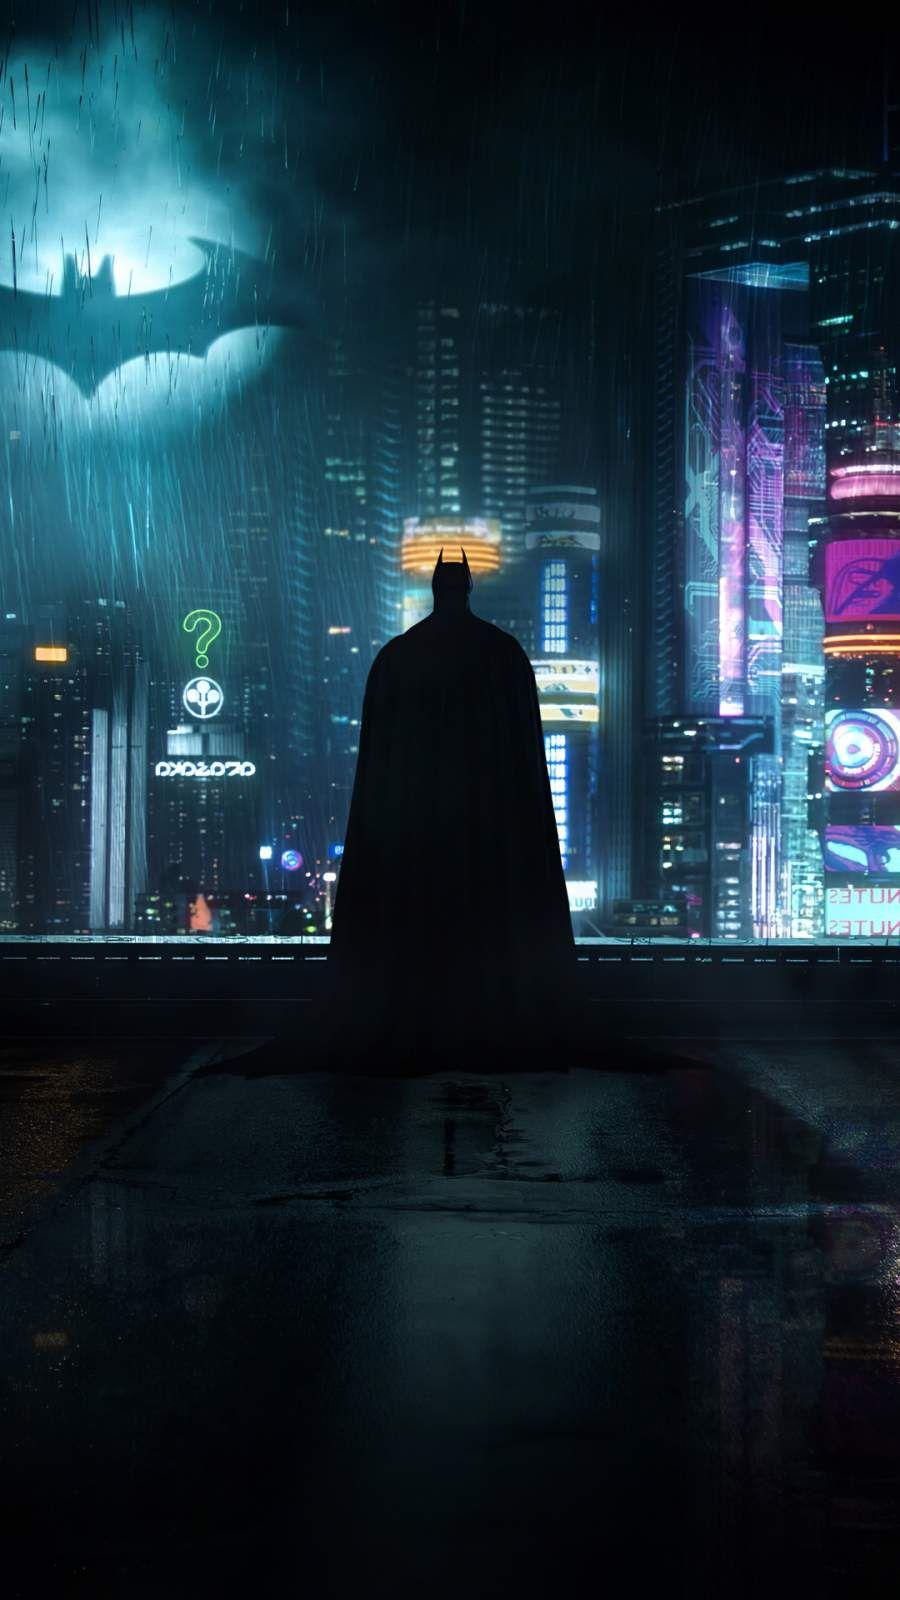 Neon Gotham Batman Iphone Wallpaper Batman Wallpaper Batman Artwork Gotham Batman